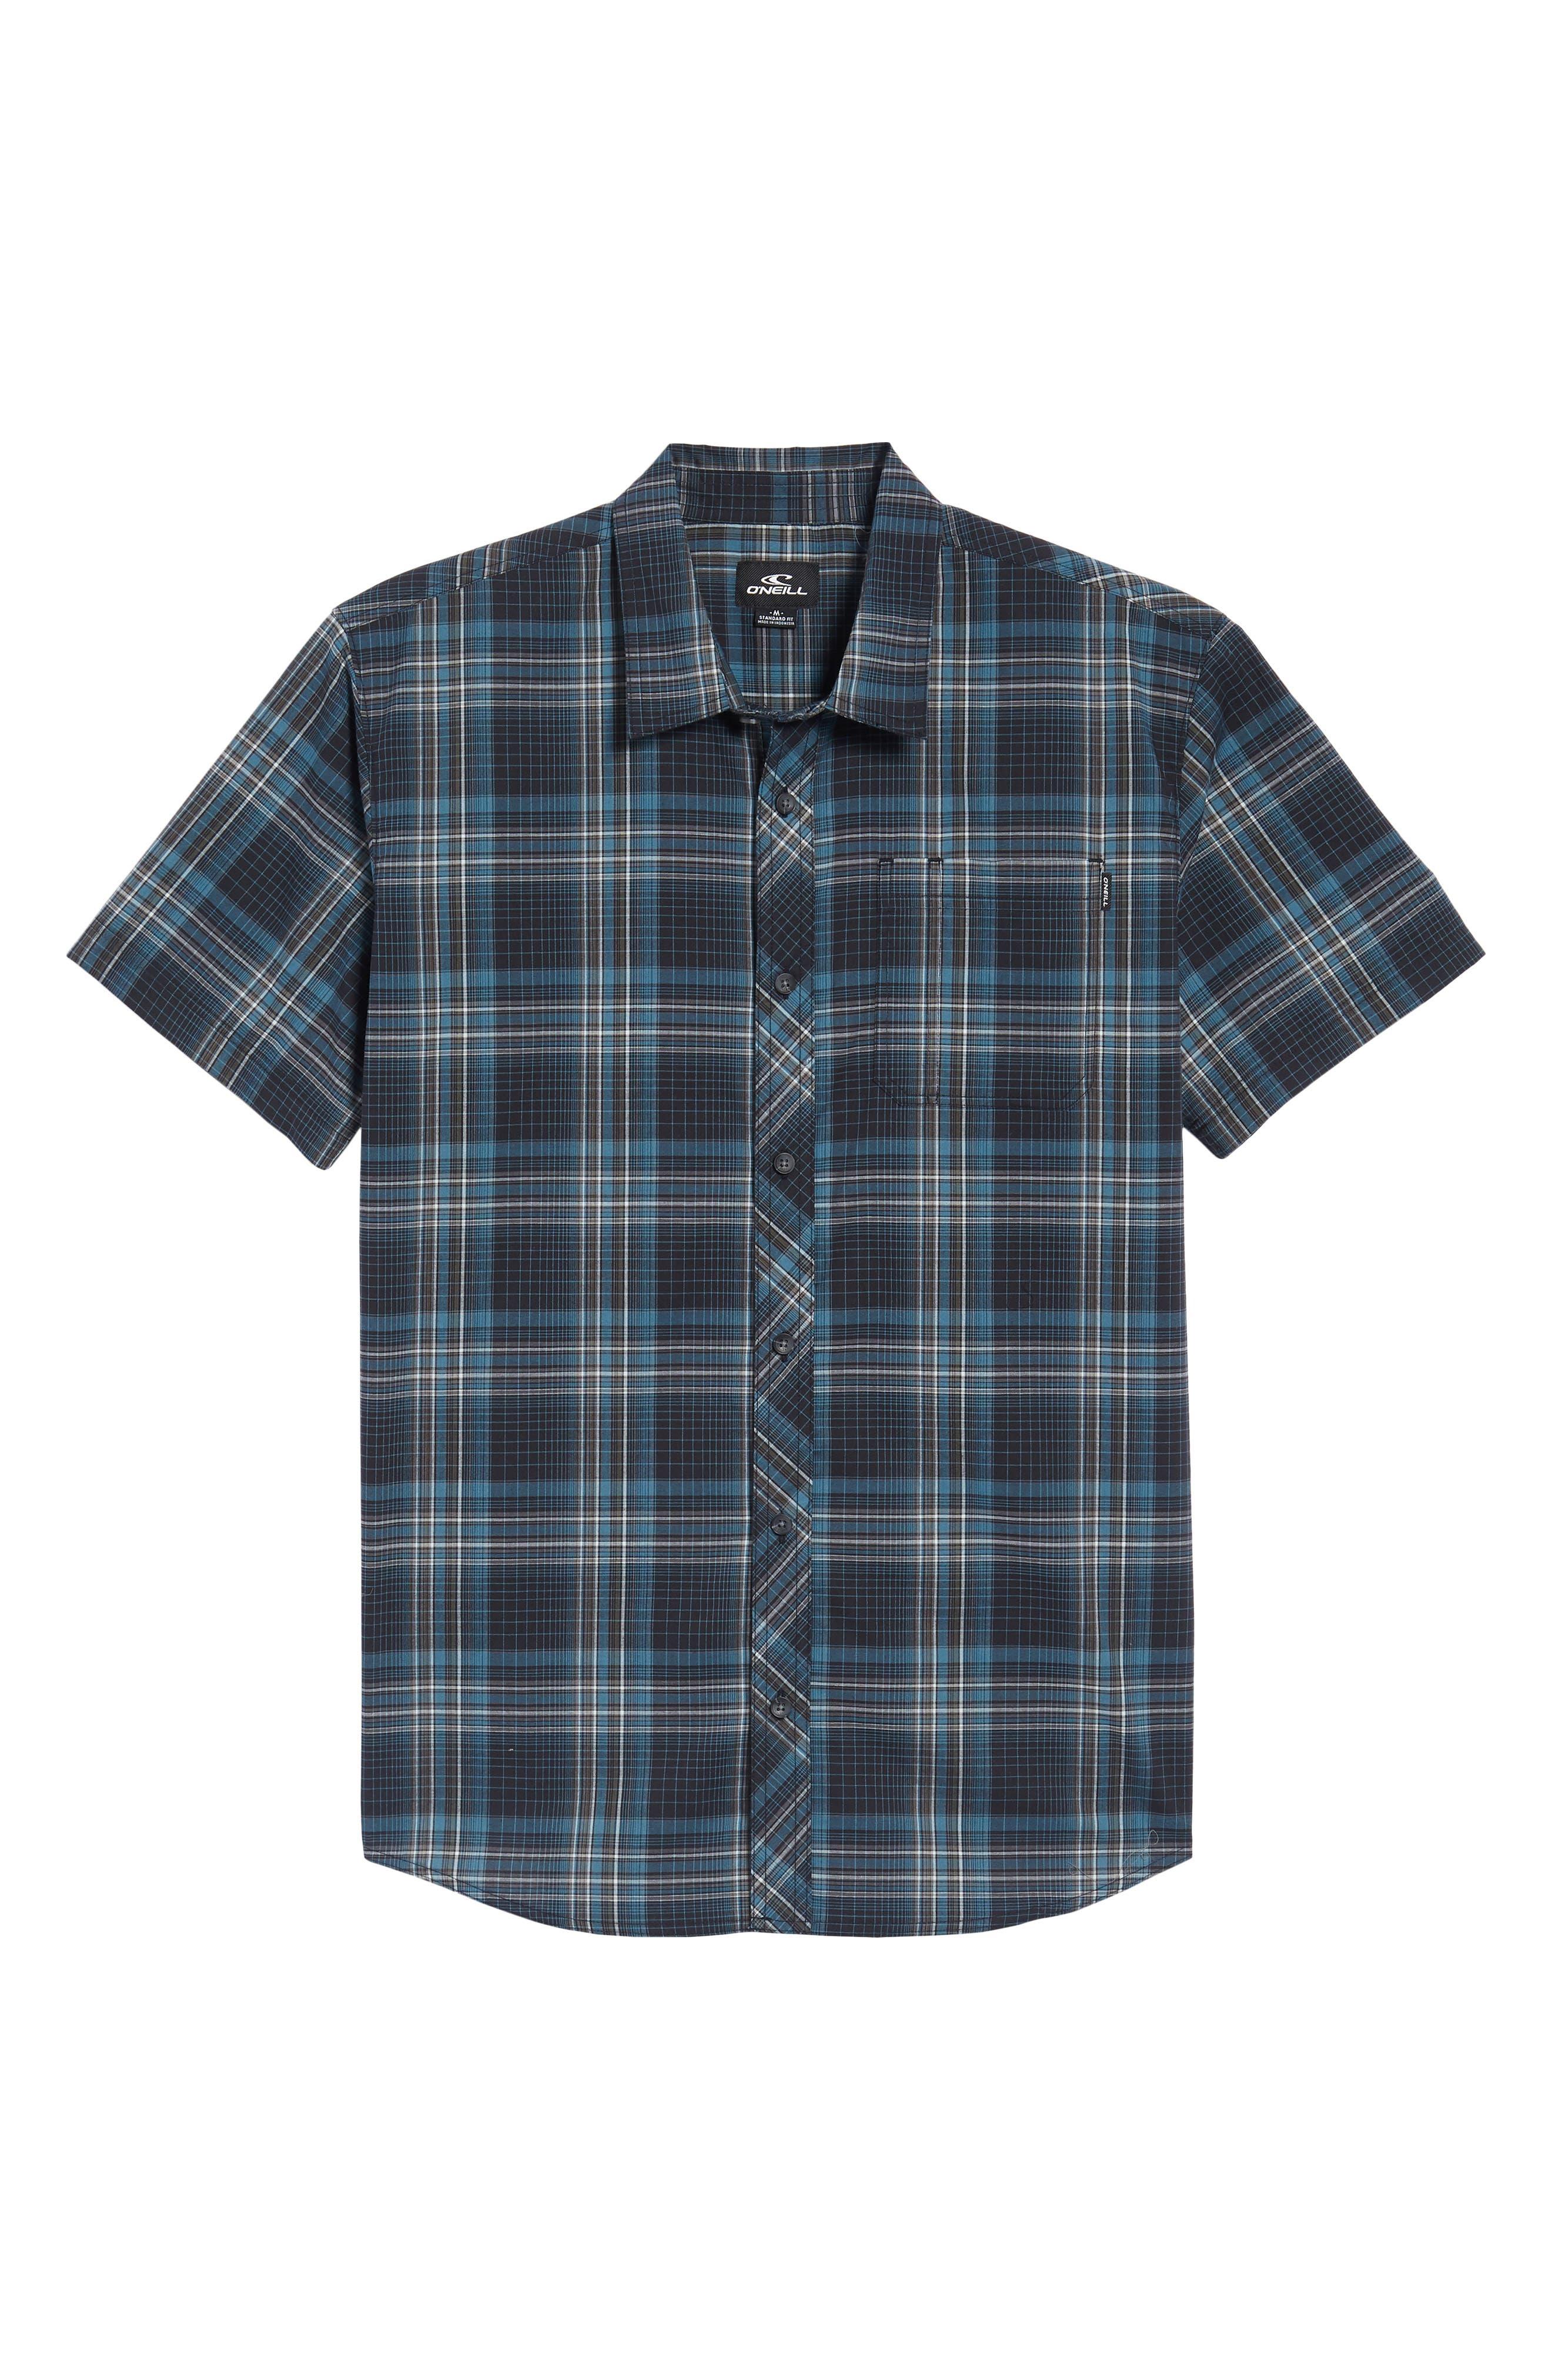 Gentry Short Sleeve Shirt,                             Alternate thumbnail 18, color,